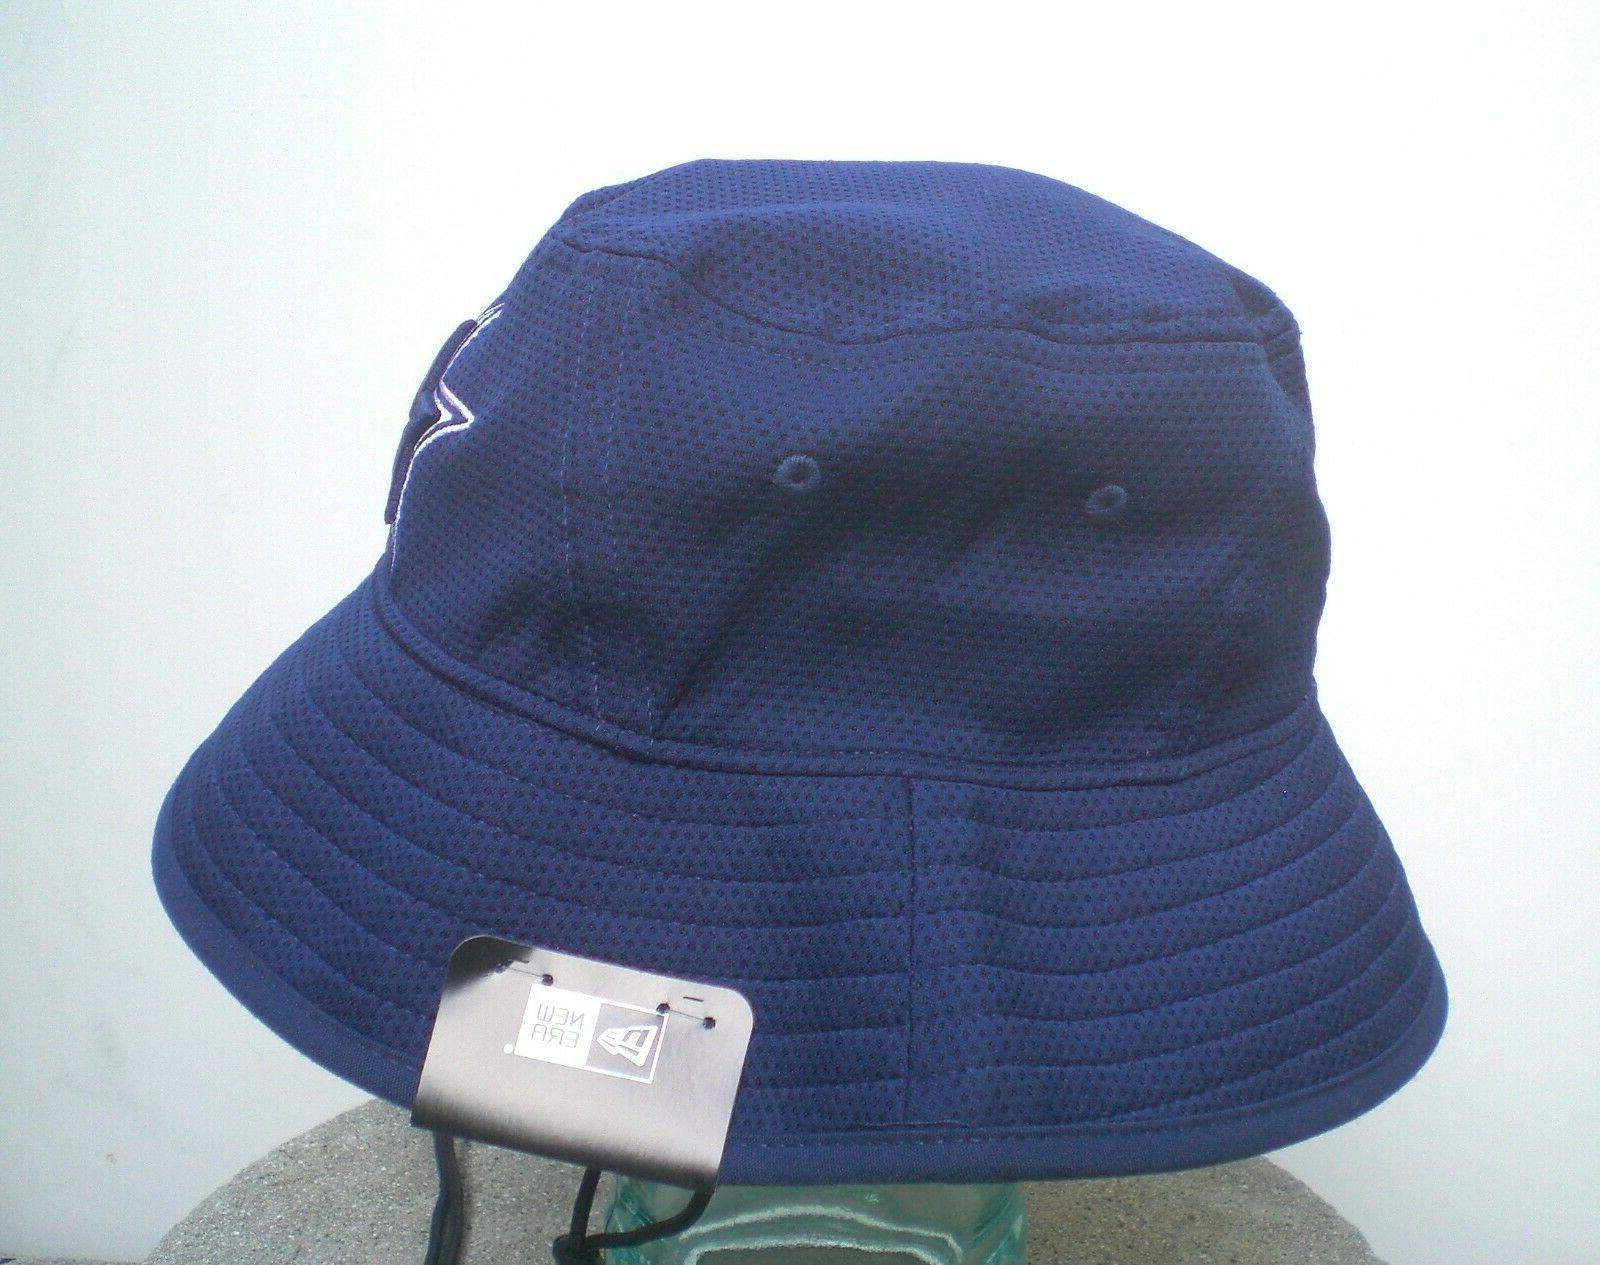 Dak Prescott Cowboys New Era Blue Bucket Hat